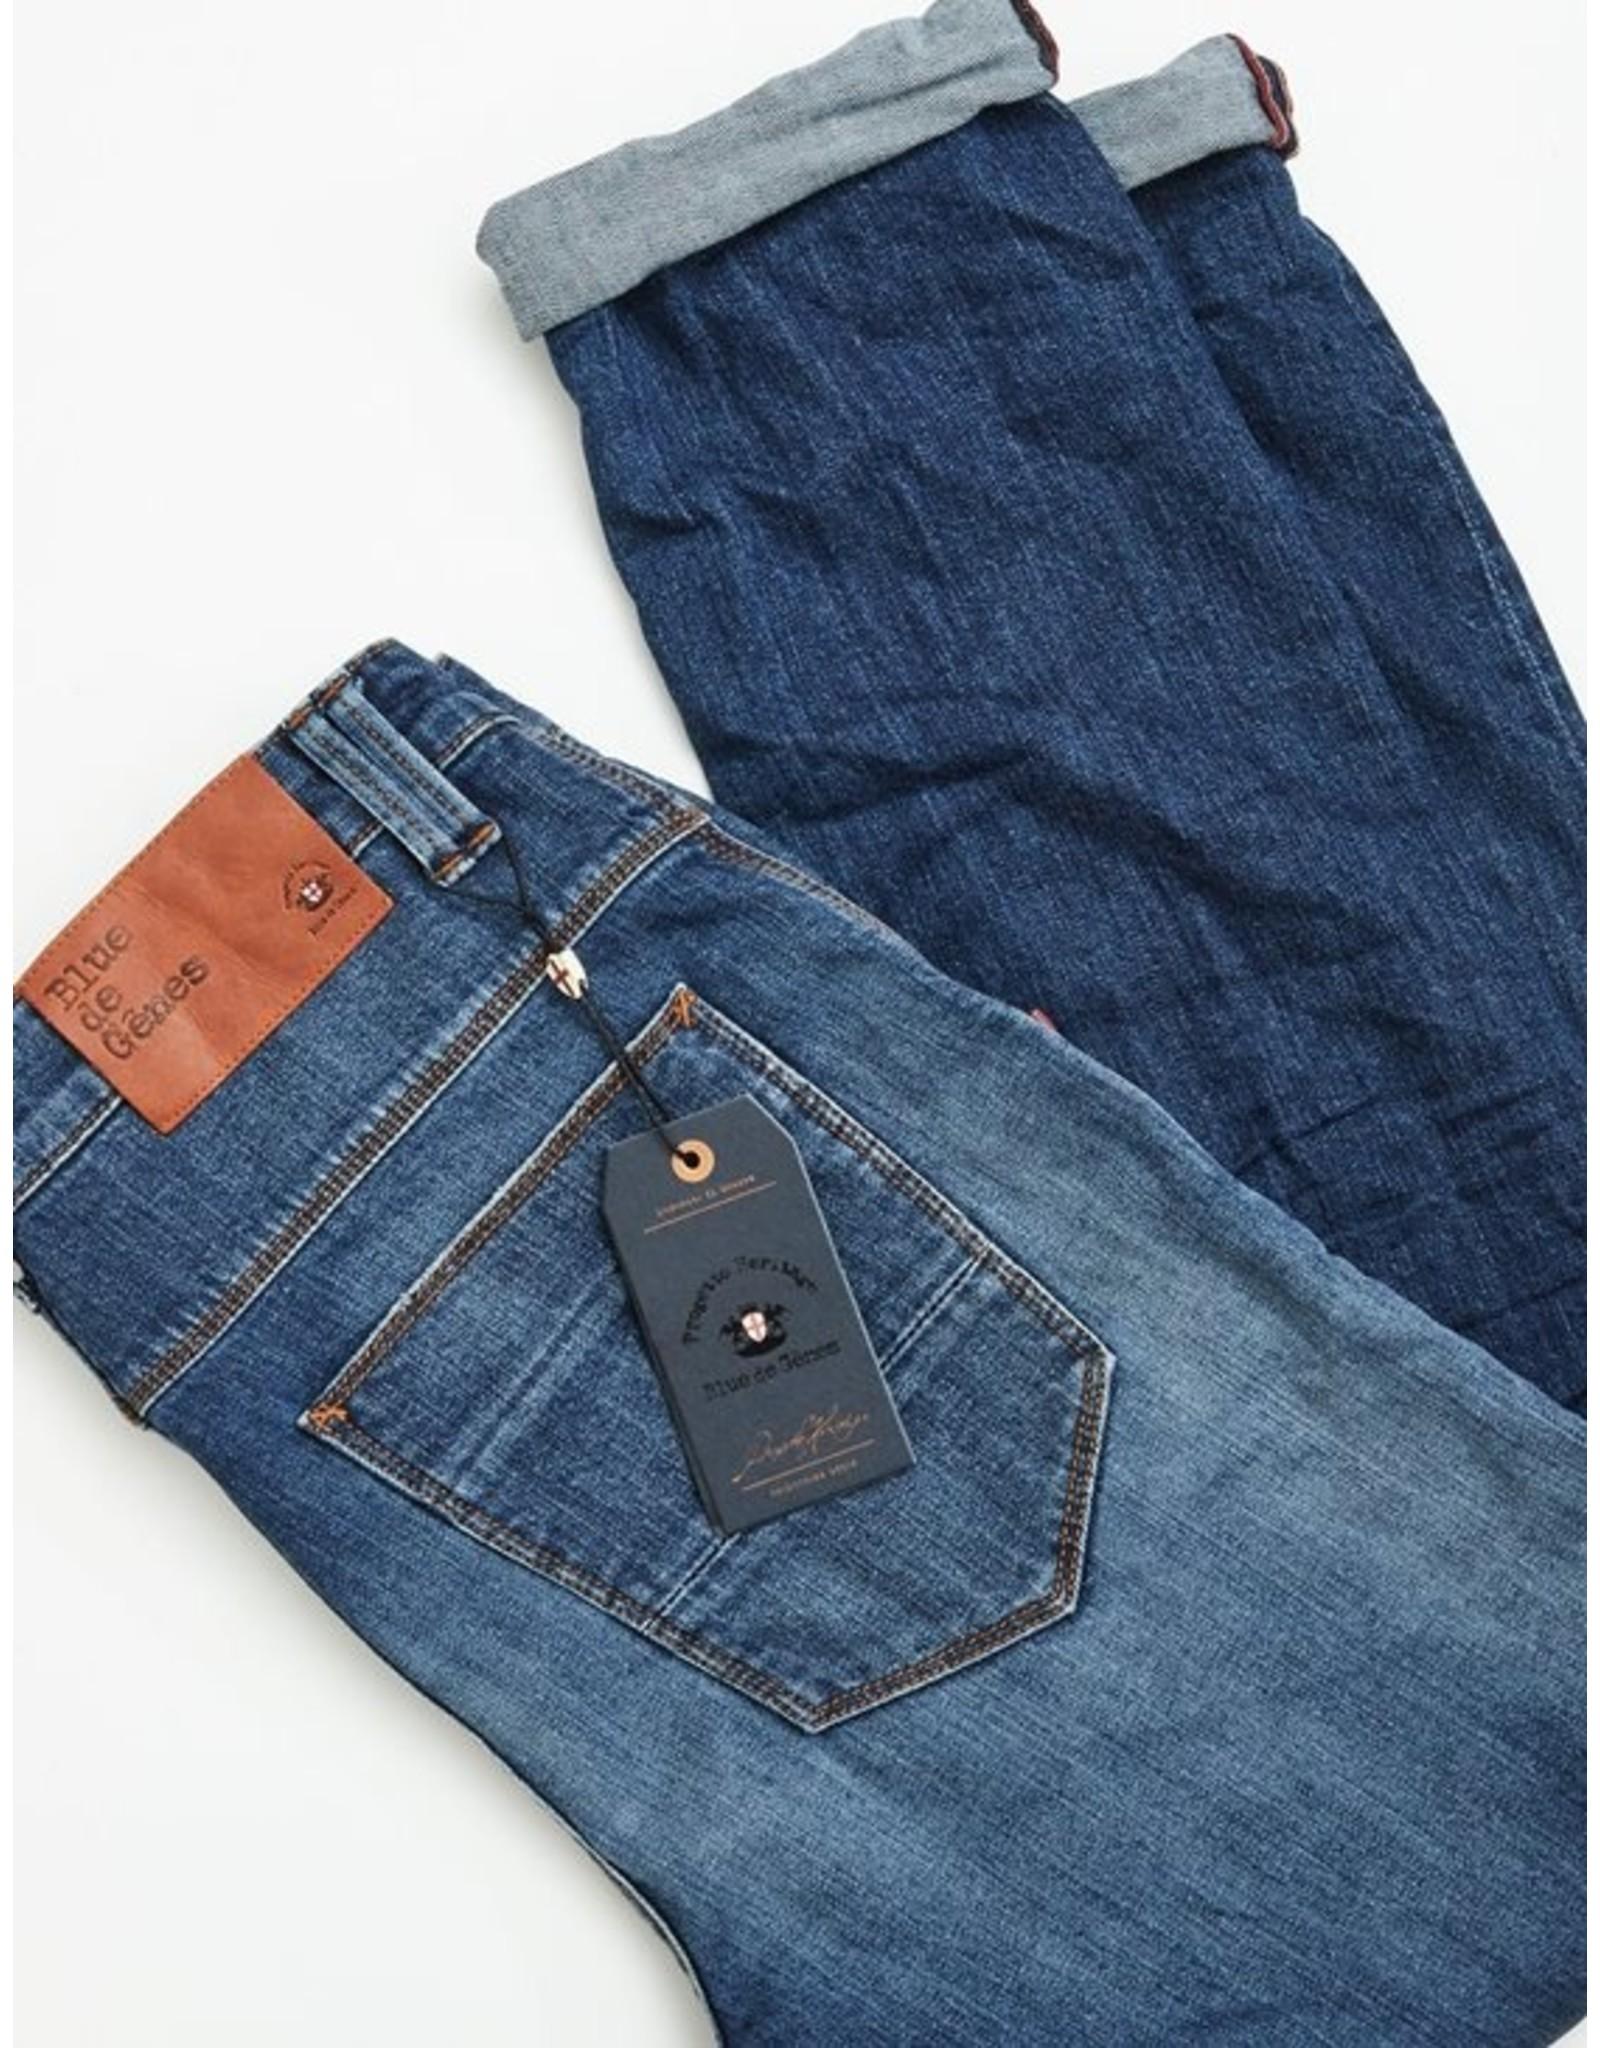 Blue de genes Paulo nevada jeans